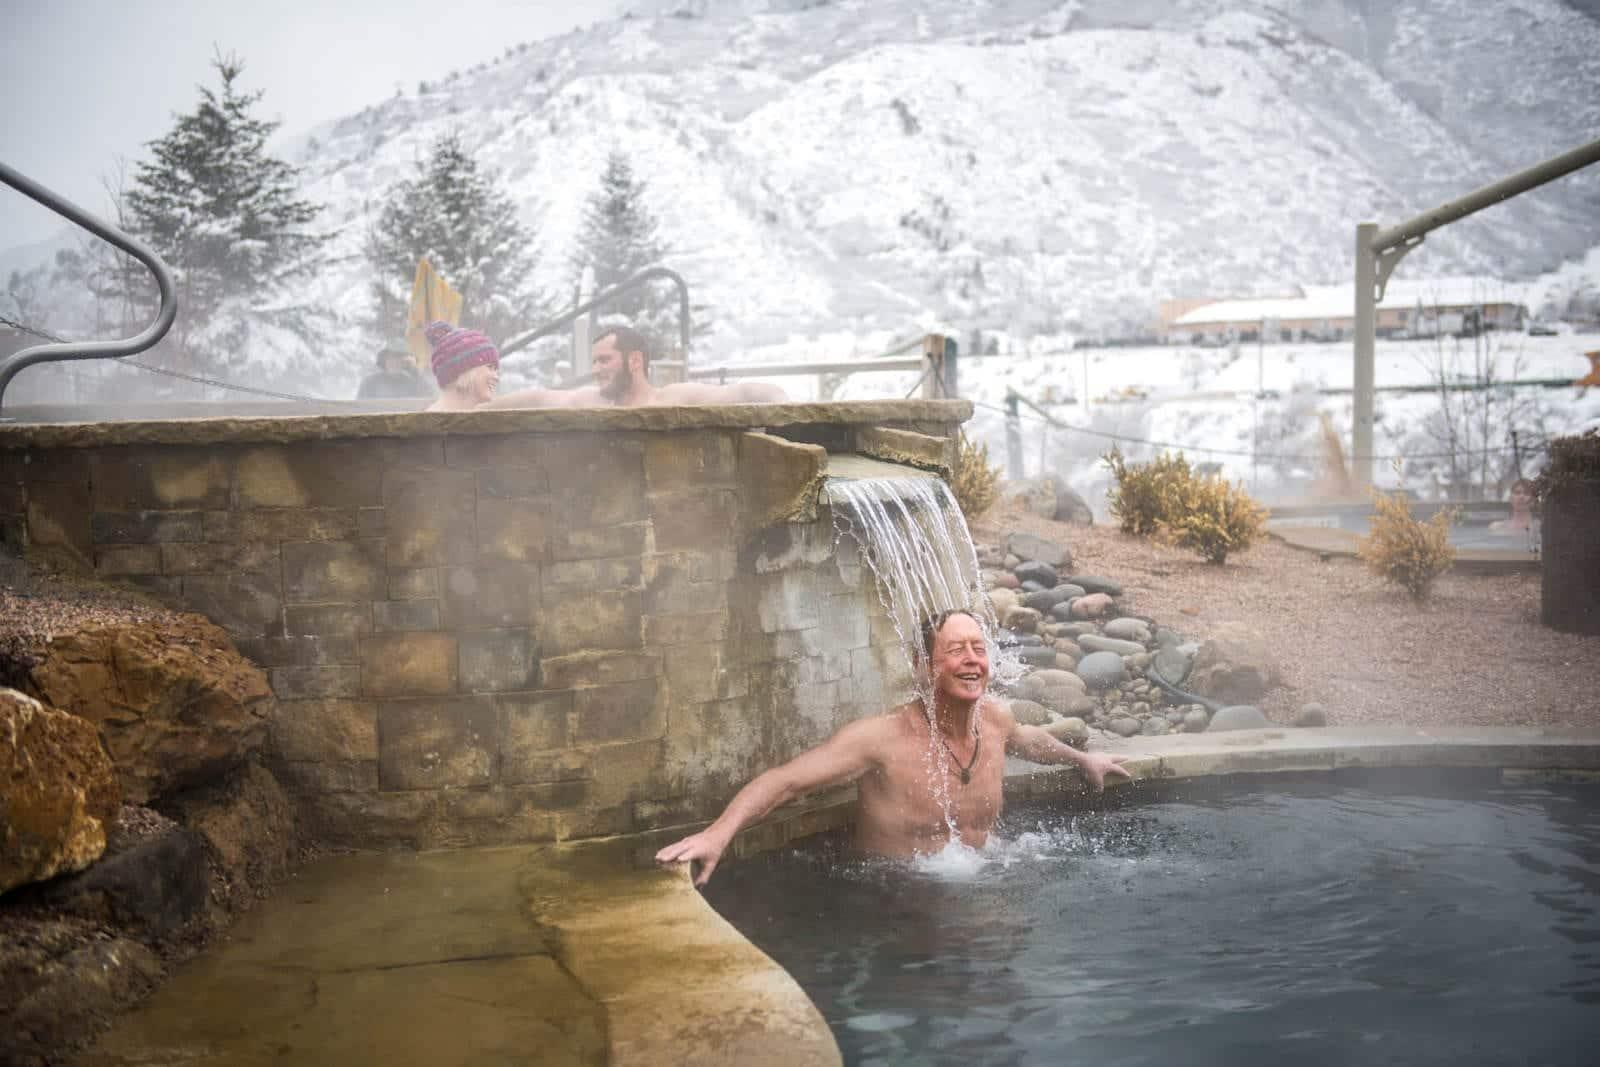 Iron Mountain Hot Springs Glenwood Springs Colorado Man Under Waterfall Pool